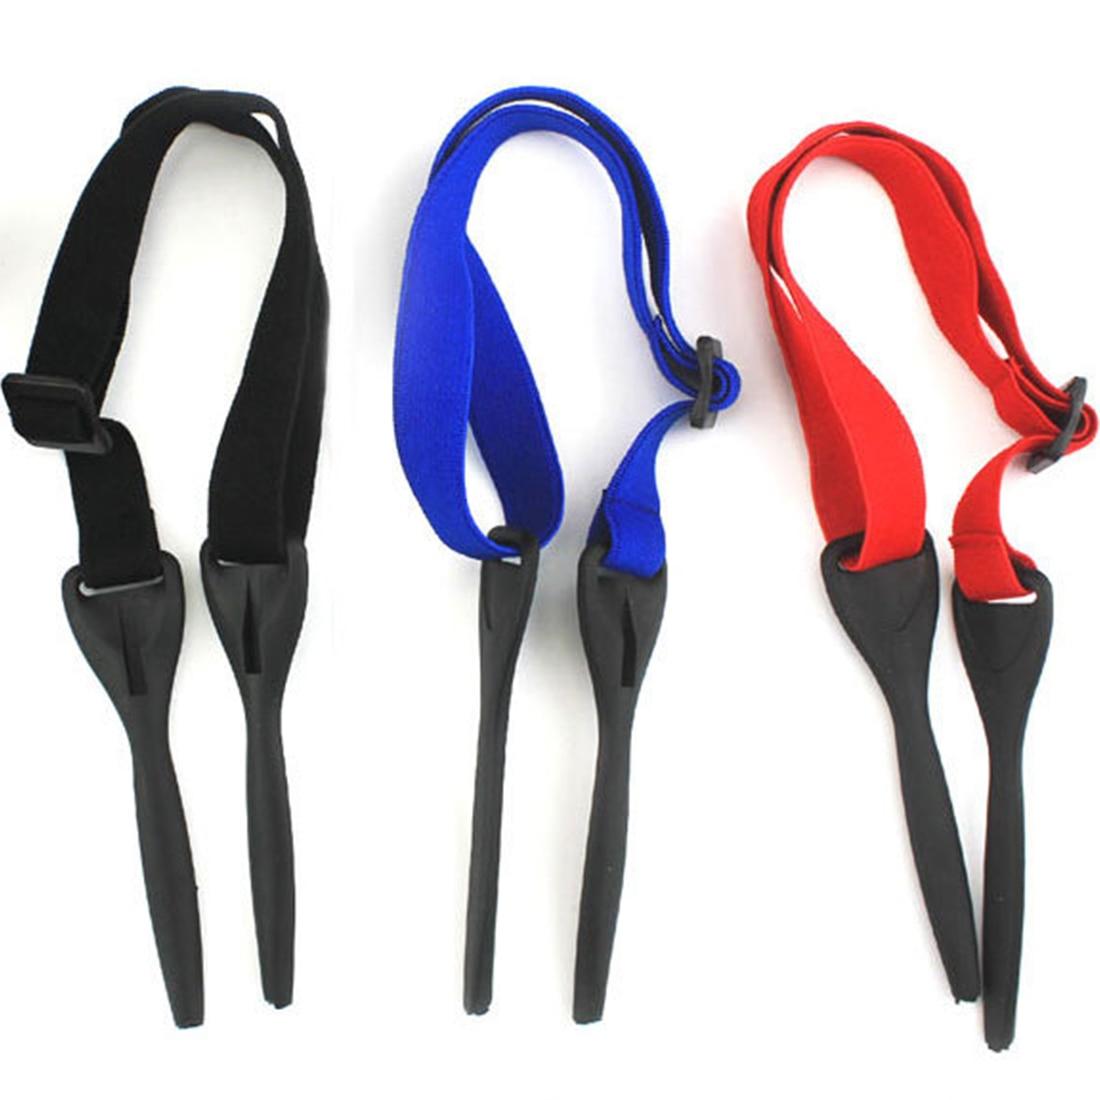 Eyewear Lanyard Holder Anti Slip Strap Nylon Glasses Strap Neck Cord 1Pcs Adjustable Sunglasses Eyeglasses Rope Accessory